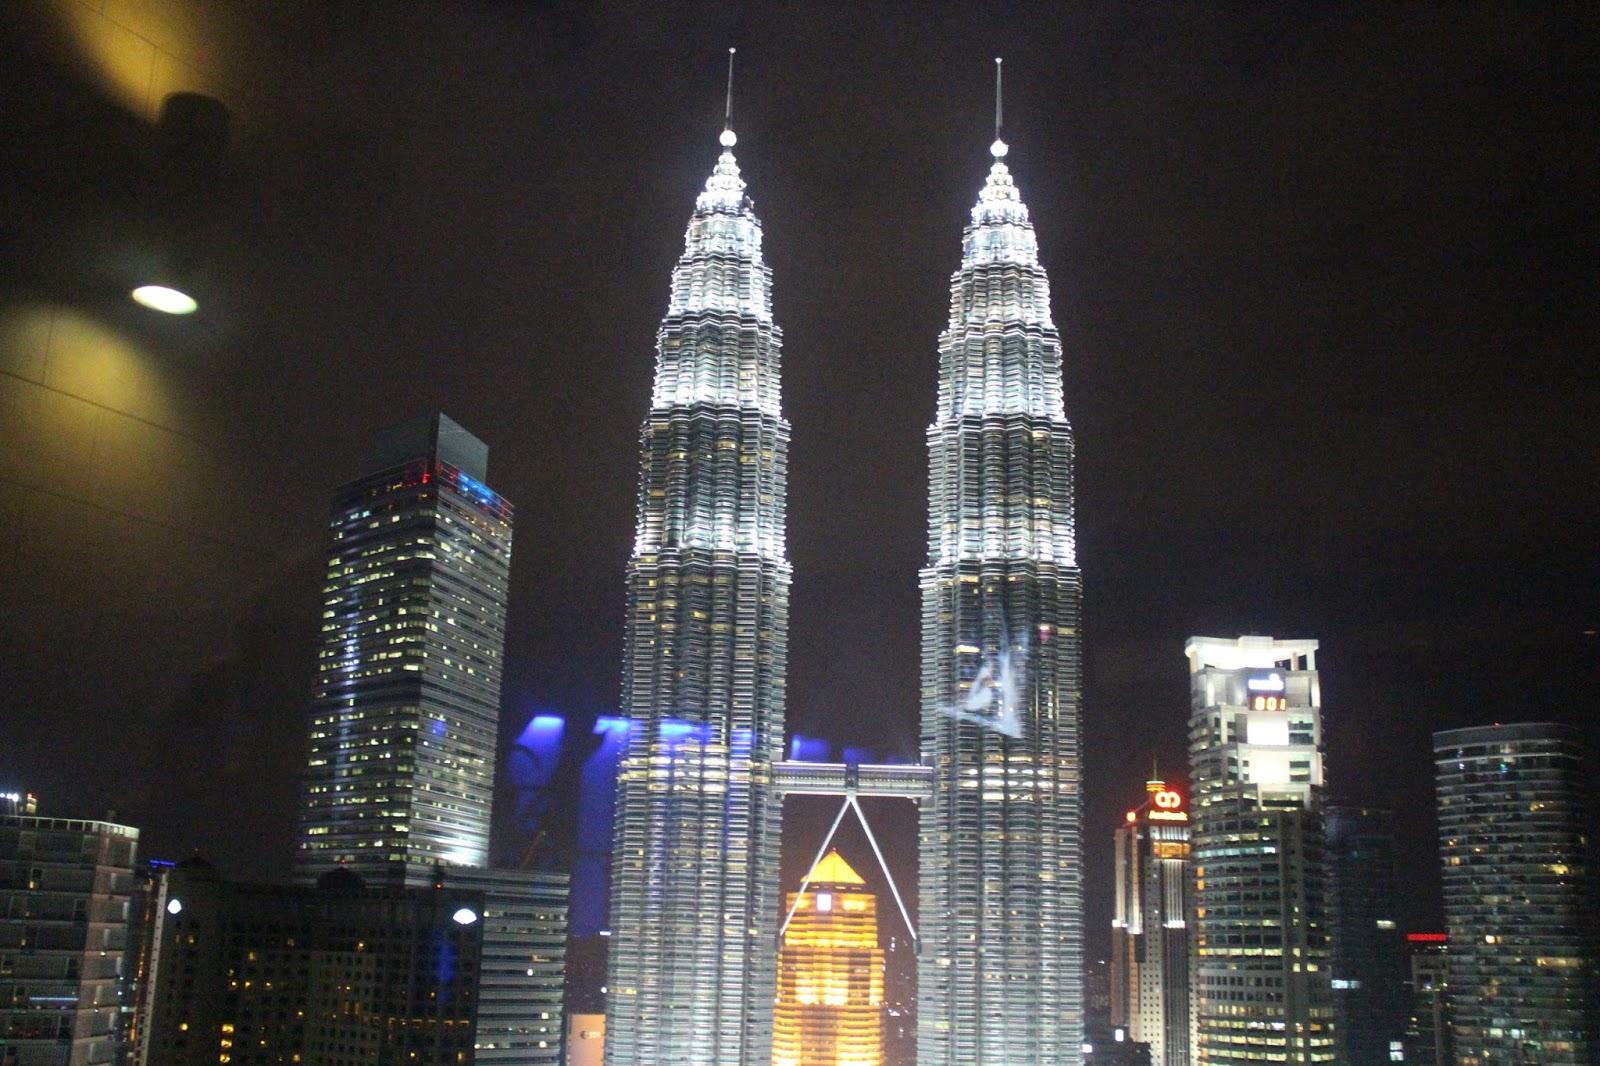 Petronas Towers at night - Kuala Lumpur